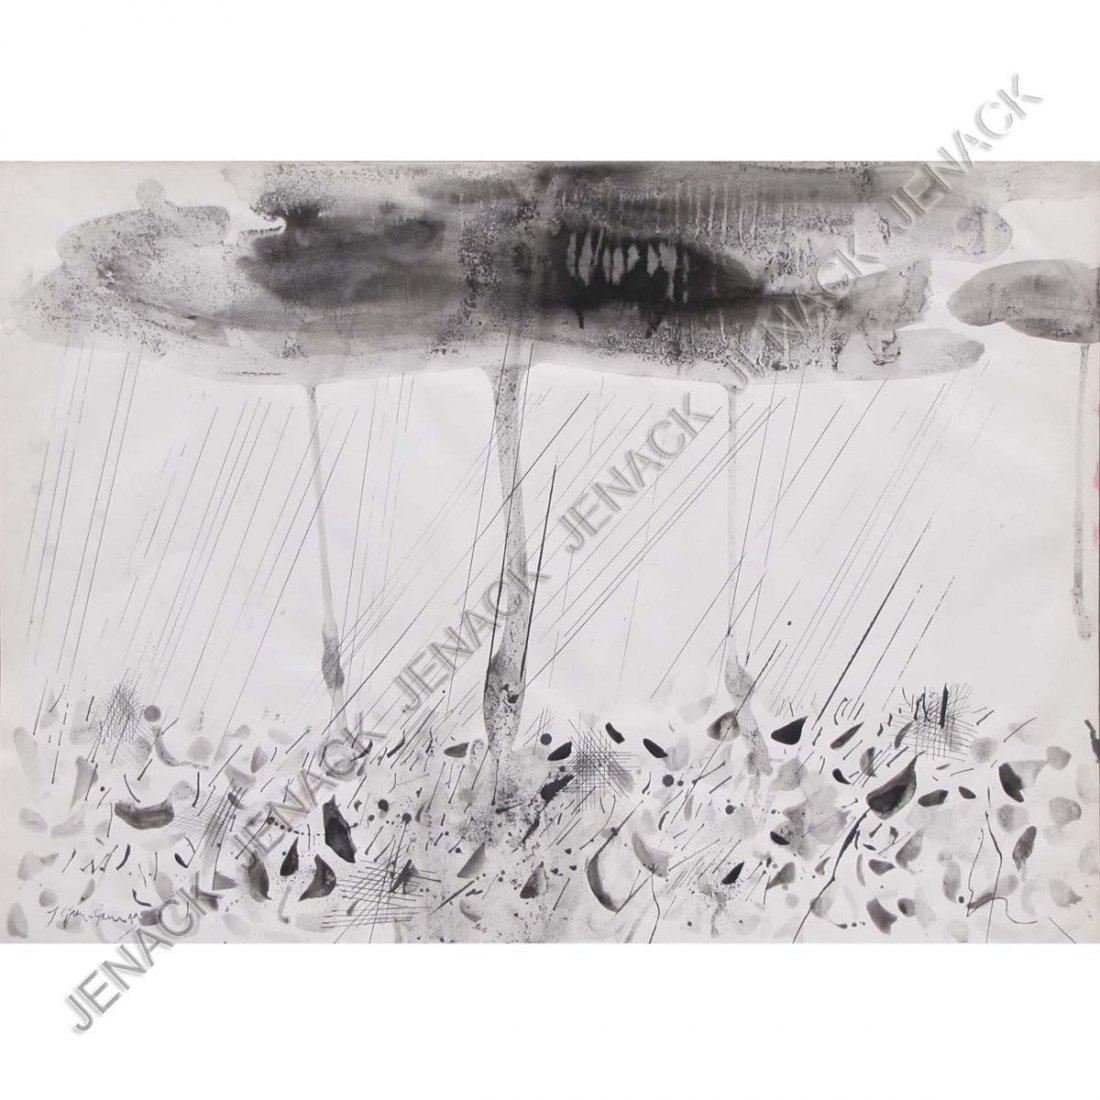 3: JOSEP GRAU GARRIGA (SPANISH 1929-), INK AND WASH